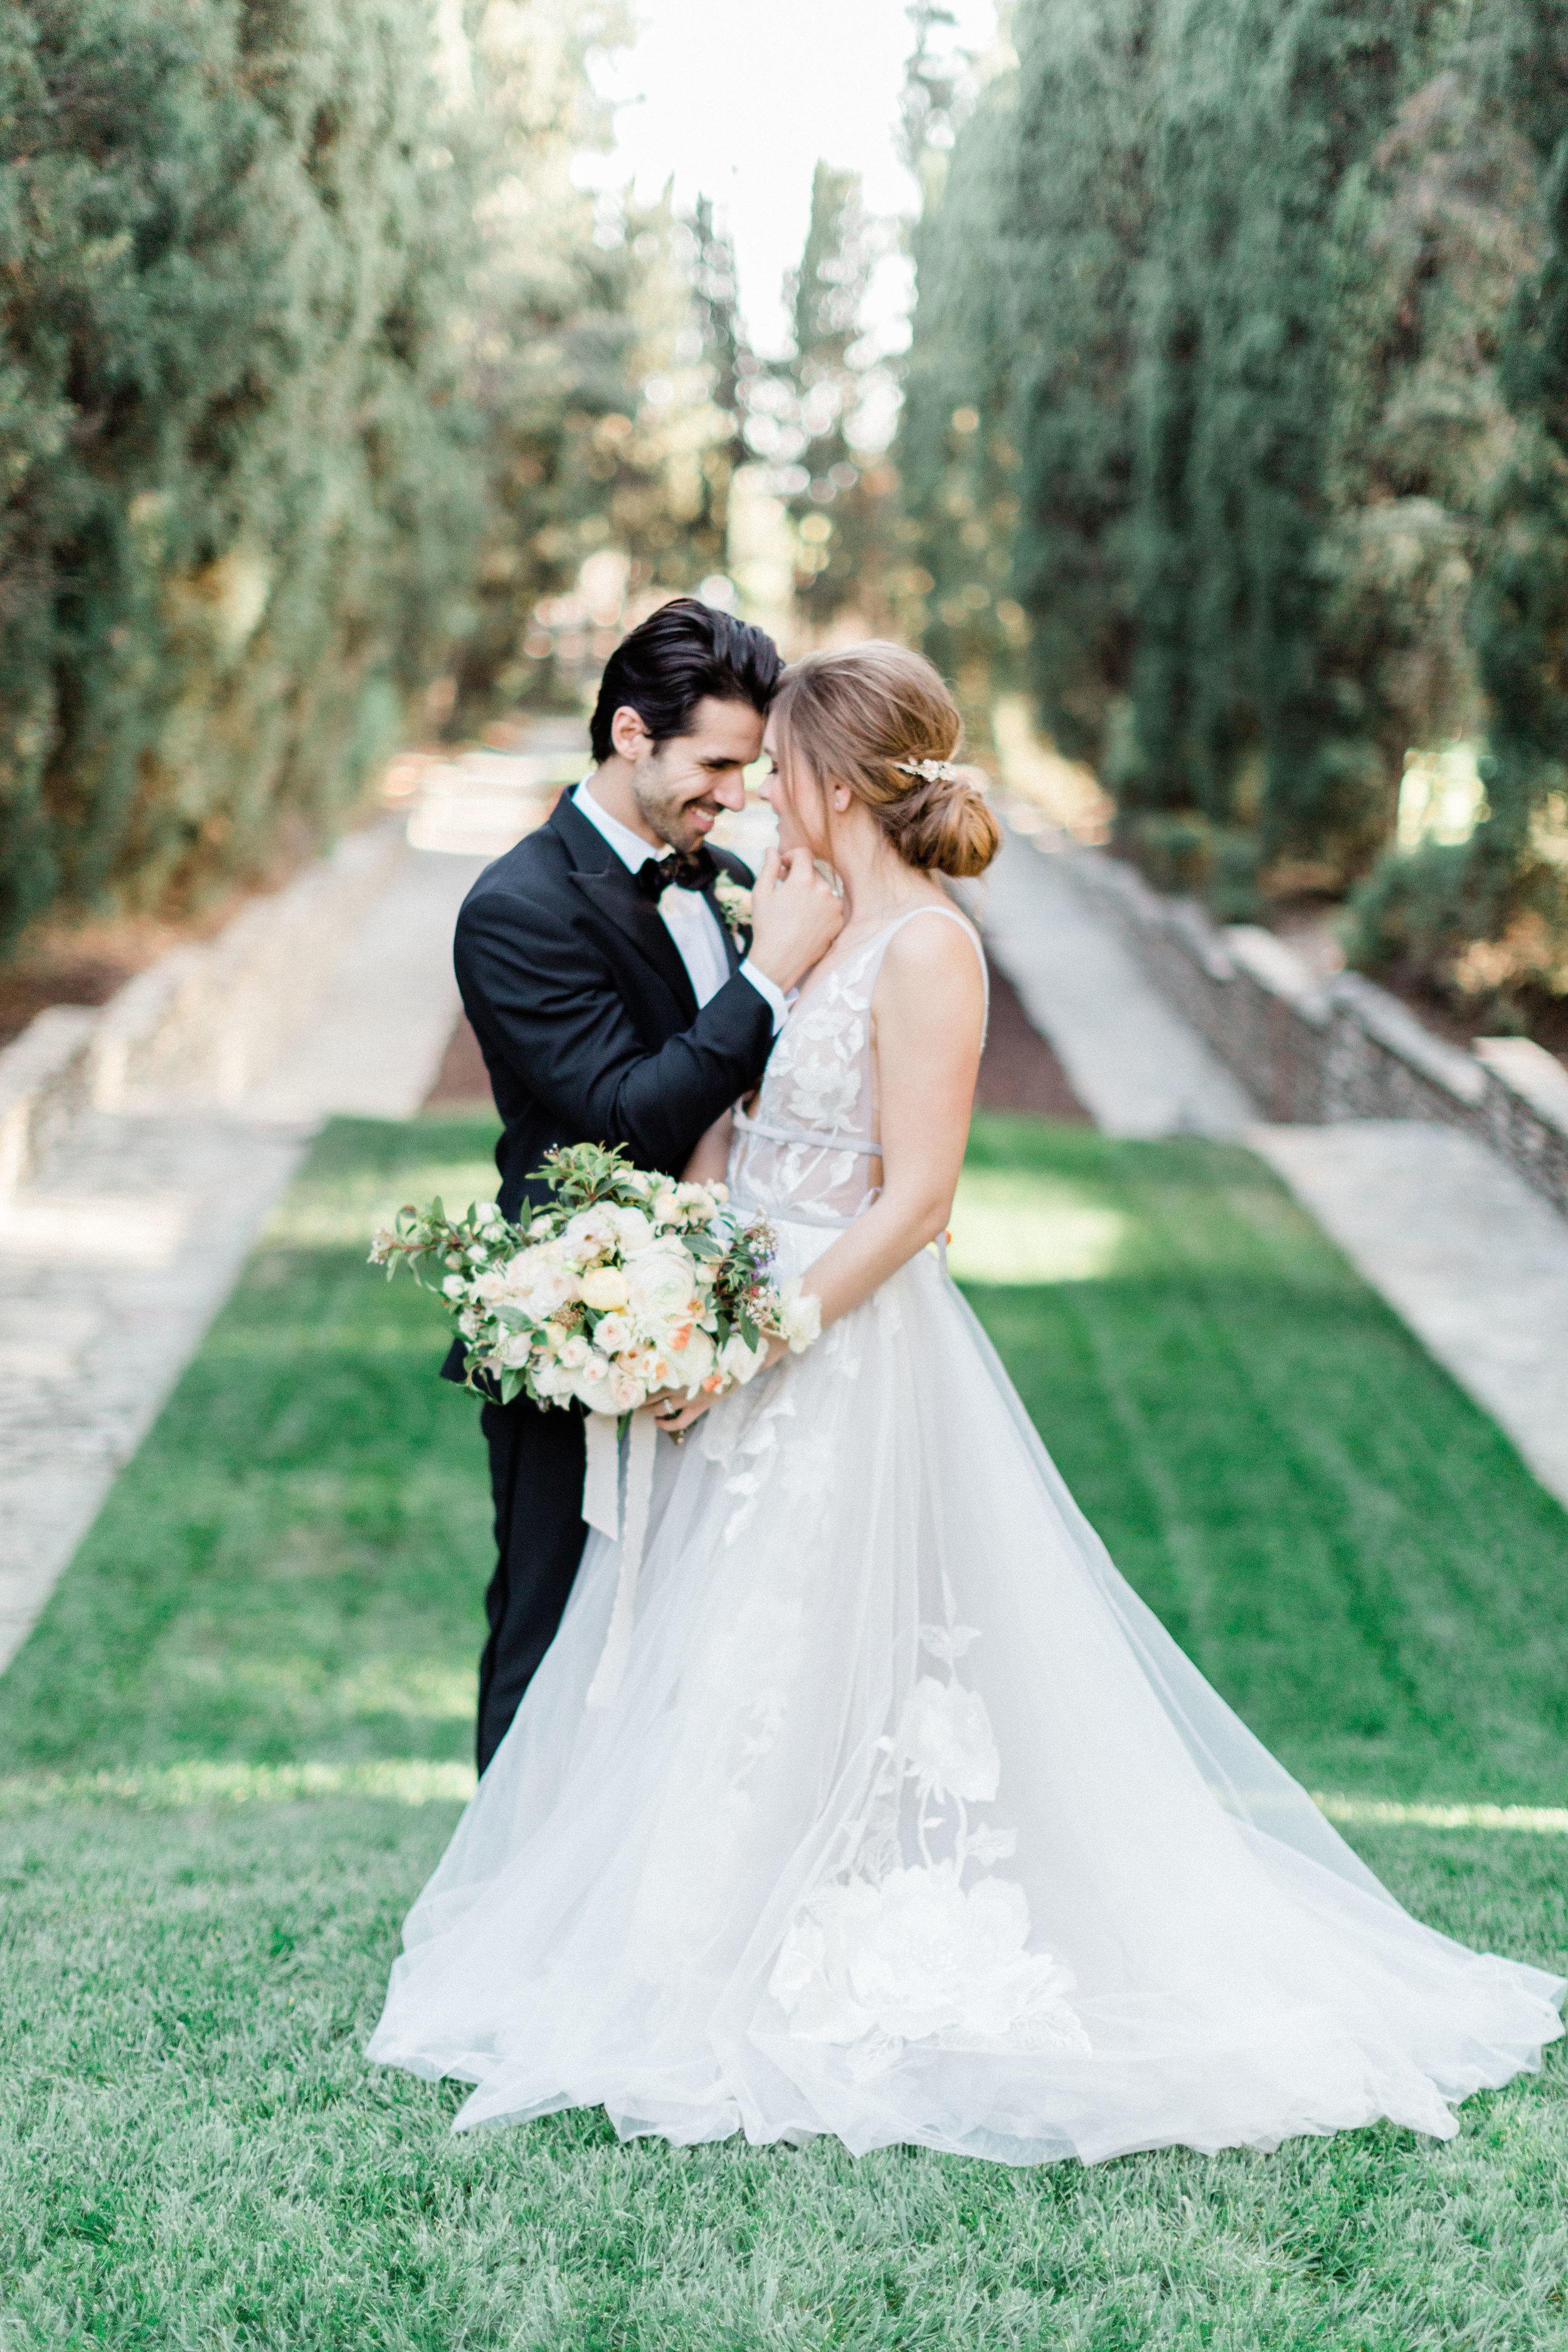 Garden_Style_Lush_Wedding_Florals_Sibyl_Sophia_Des_Moines_Iowa.jpg